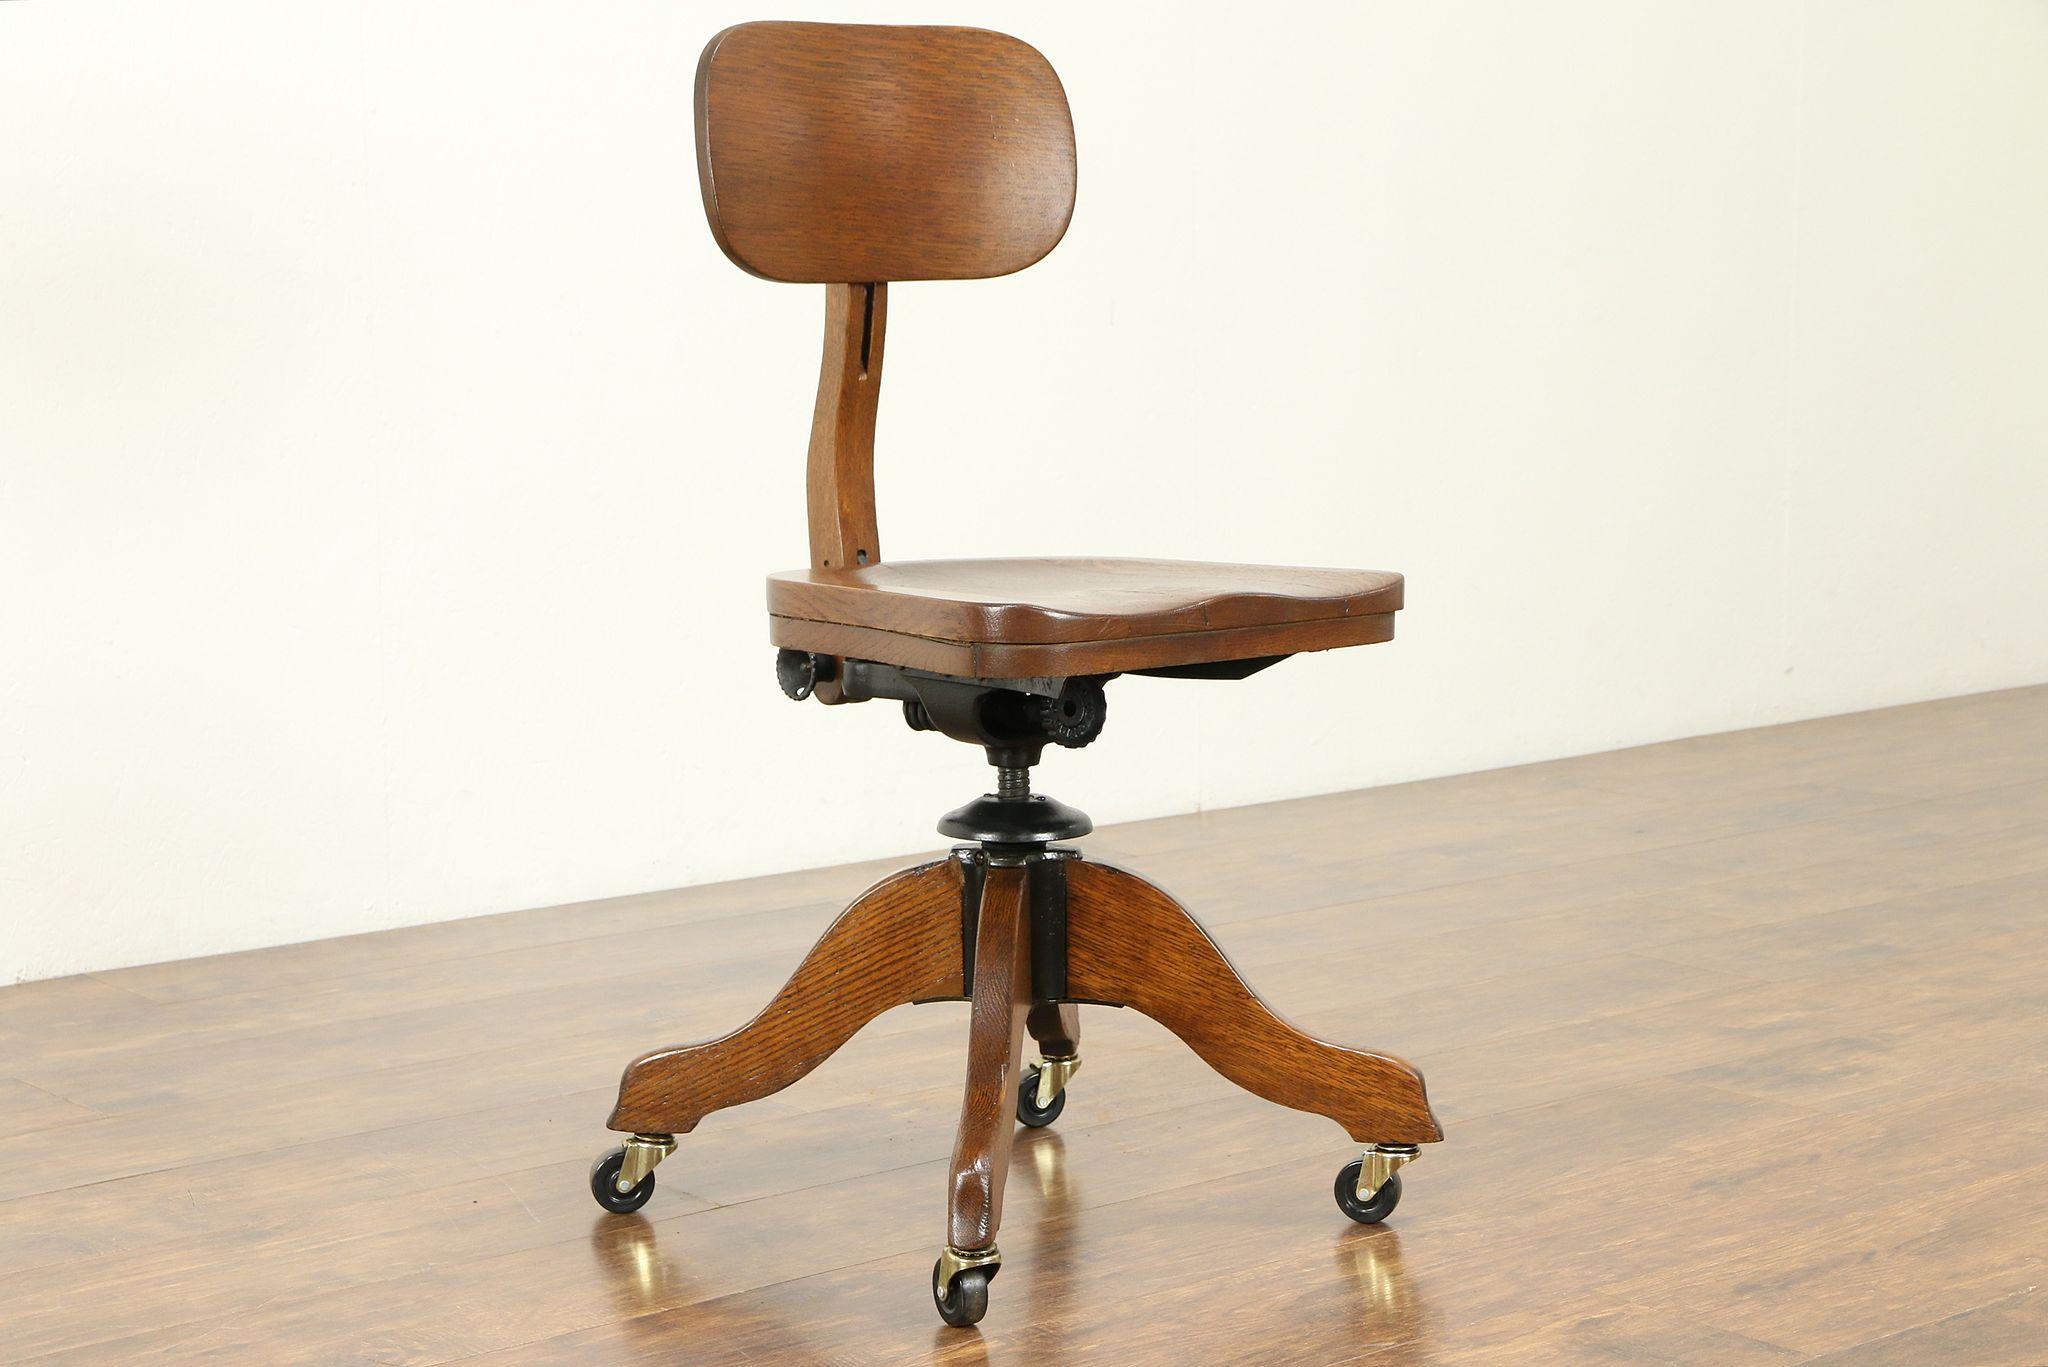 Groovy Swivel Quarter Sawn Oak 1925 Antique Desk Chair Adjustable Johnson 30955 Forskolin Free Trial Chair Design Images Forskolin Free Trialorg